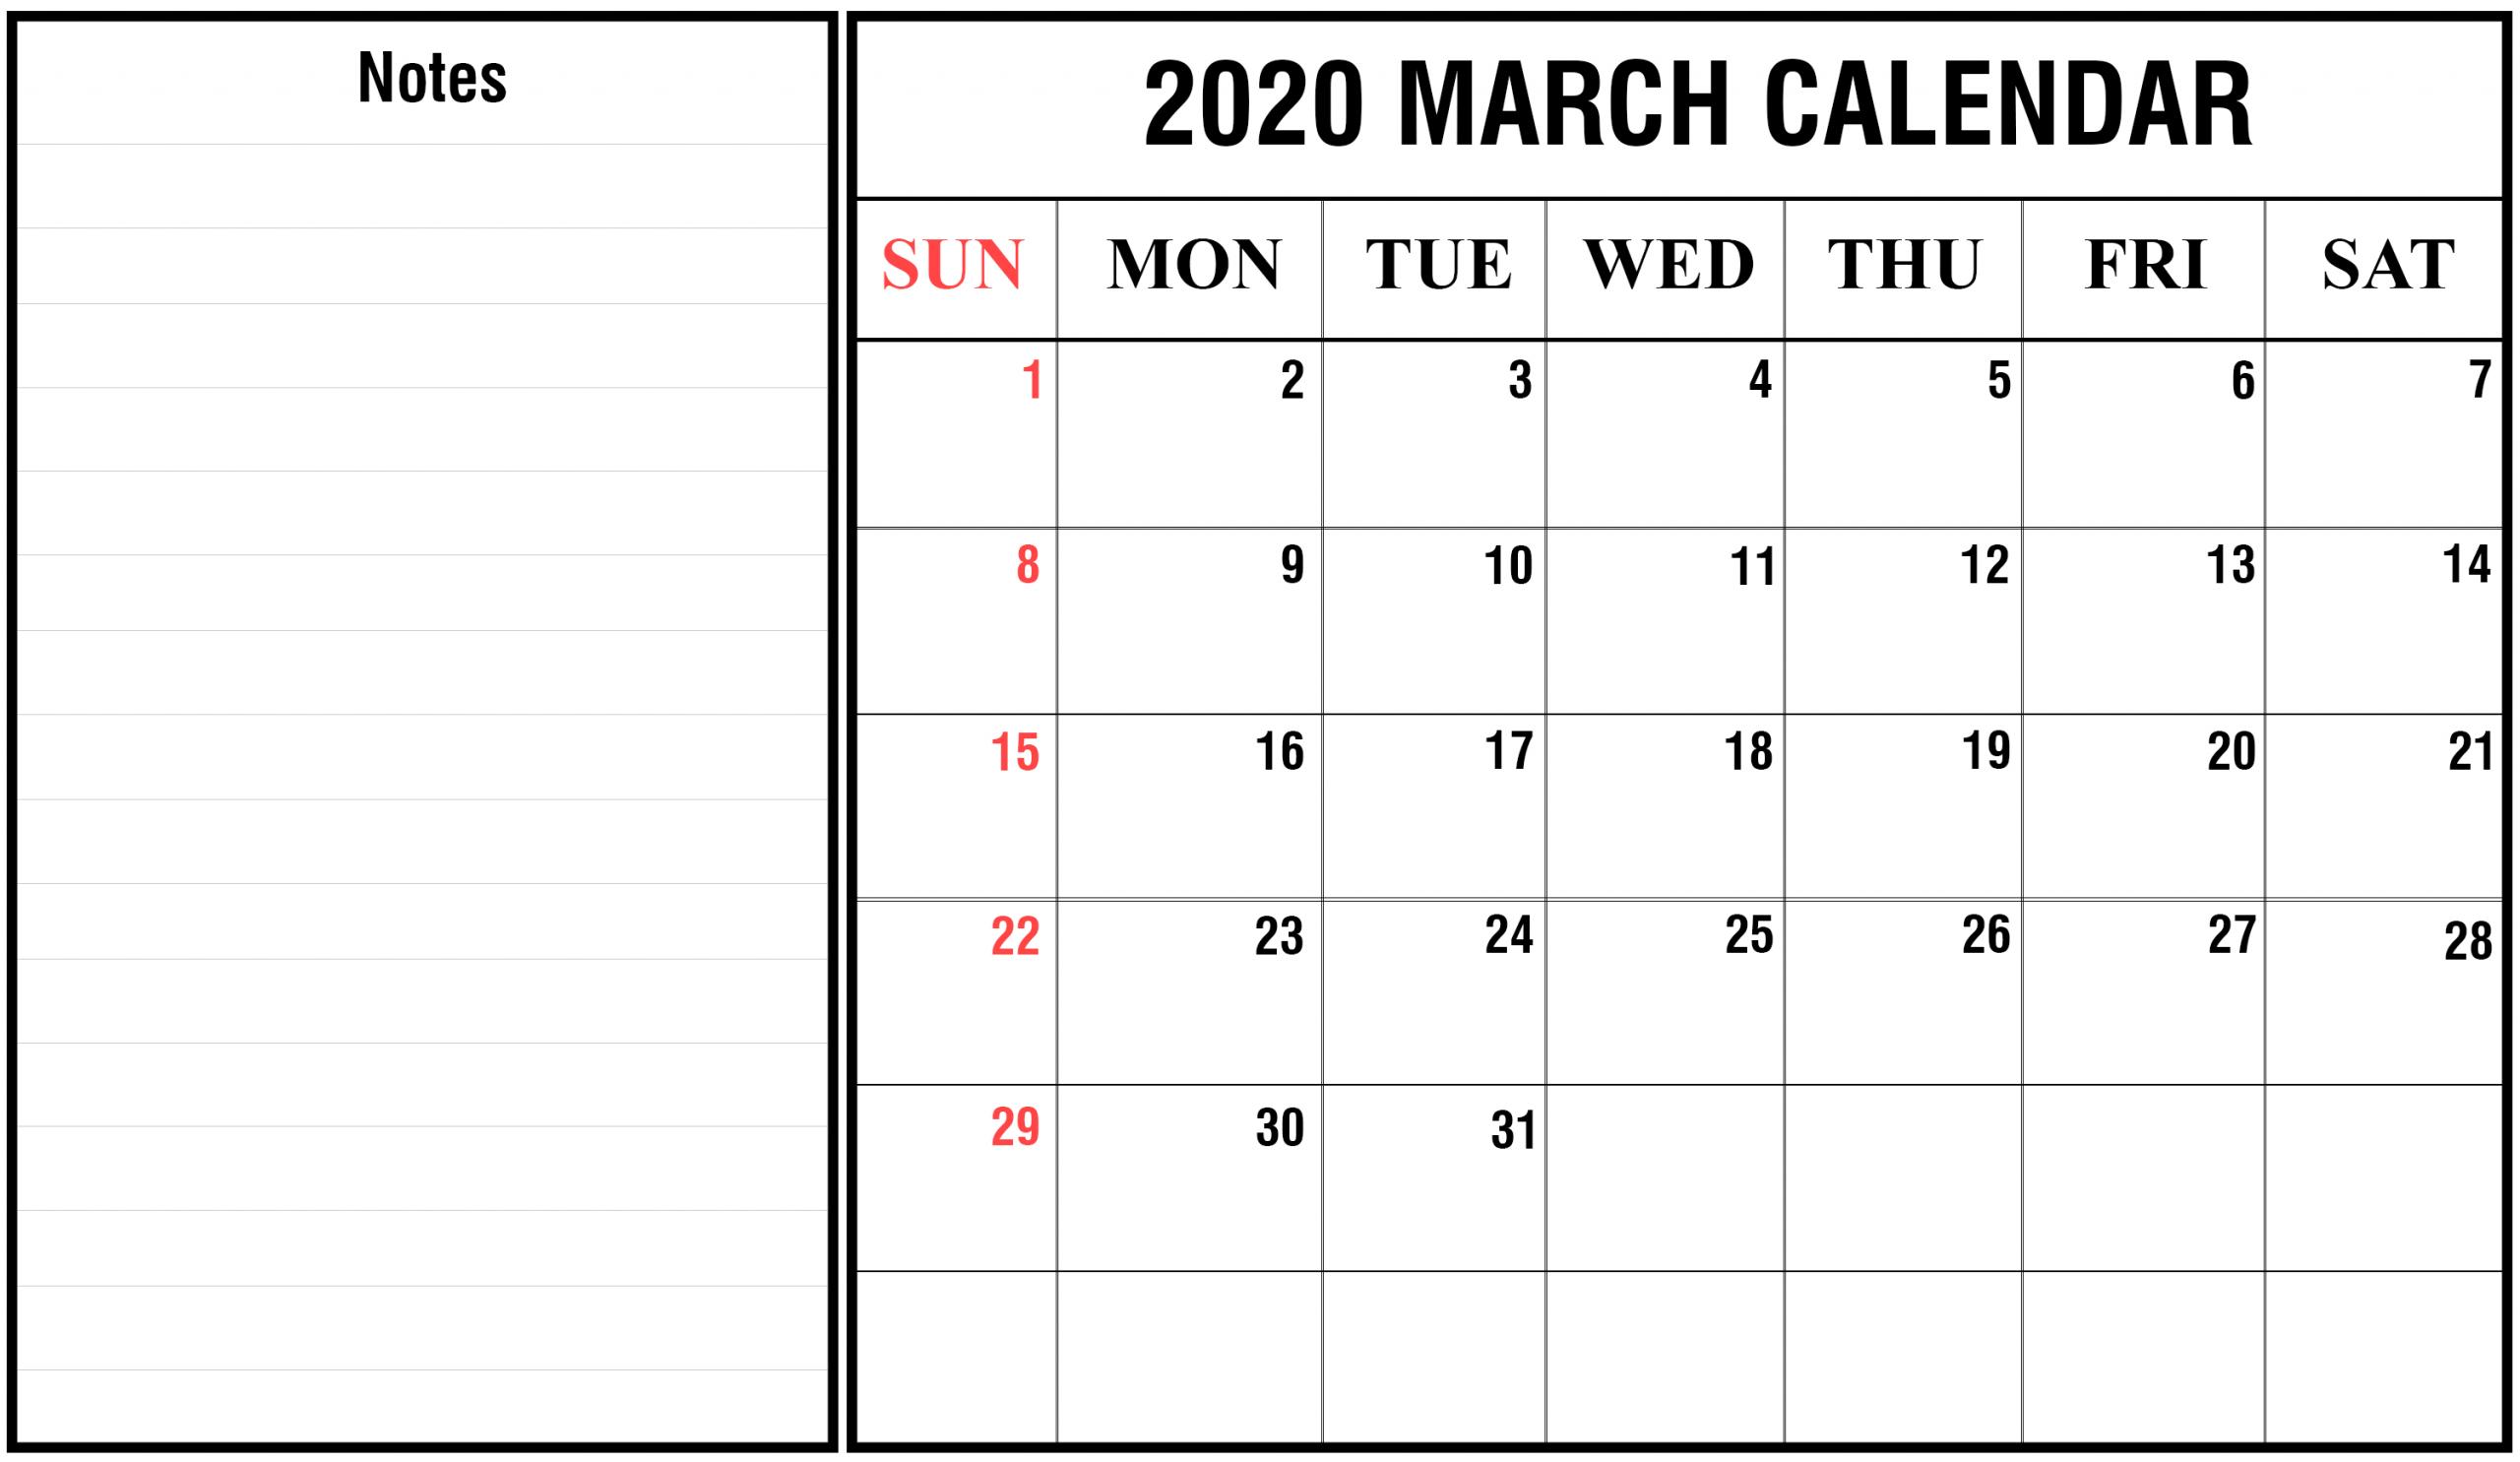 2020 Calendar You Can Edit | Calendar Template Printable April Calendar That Can Be Edit